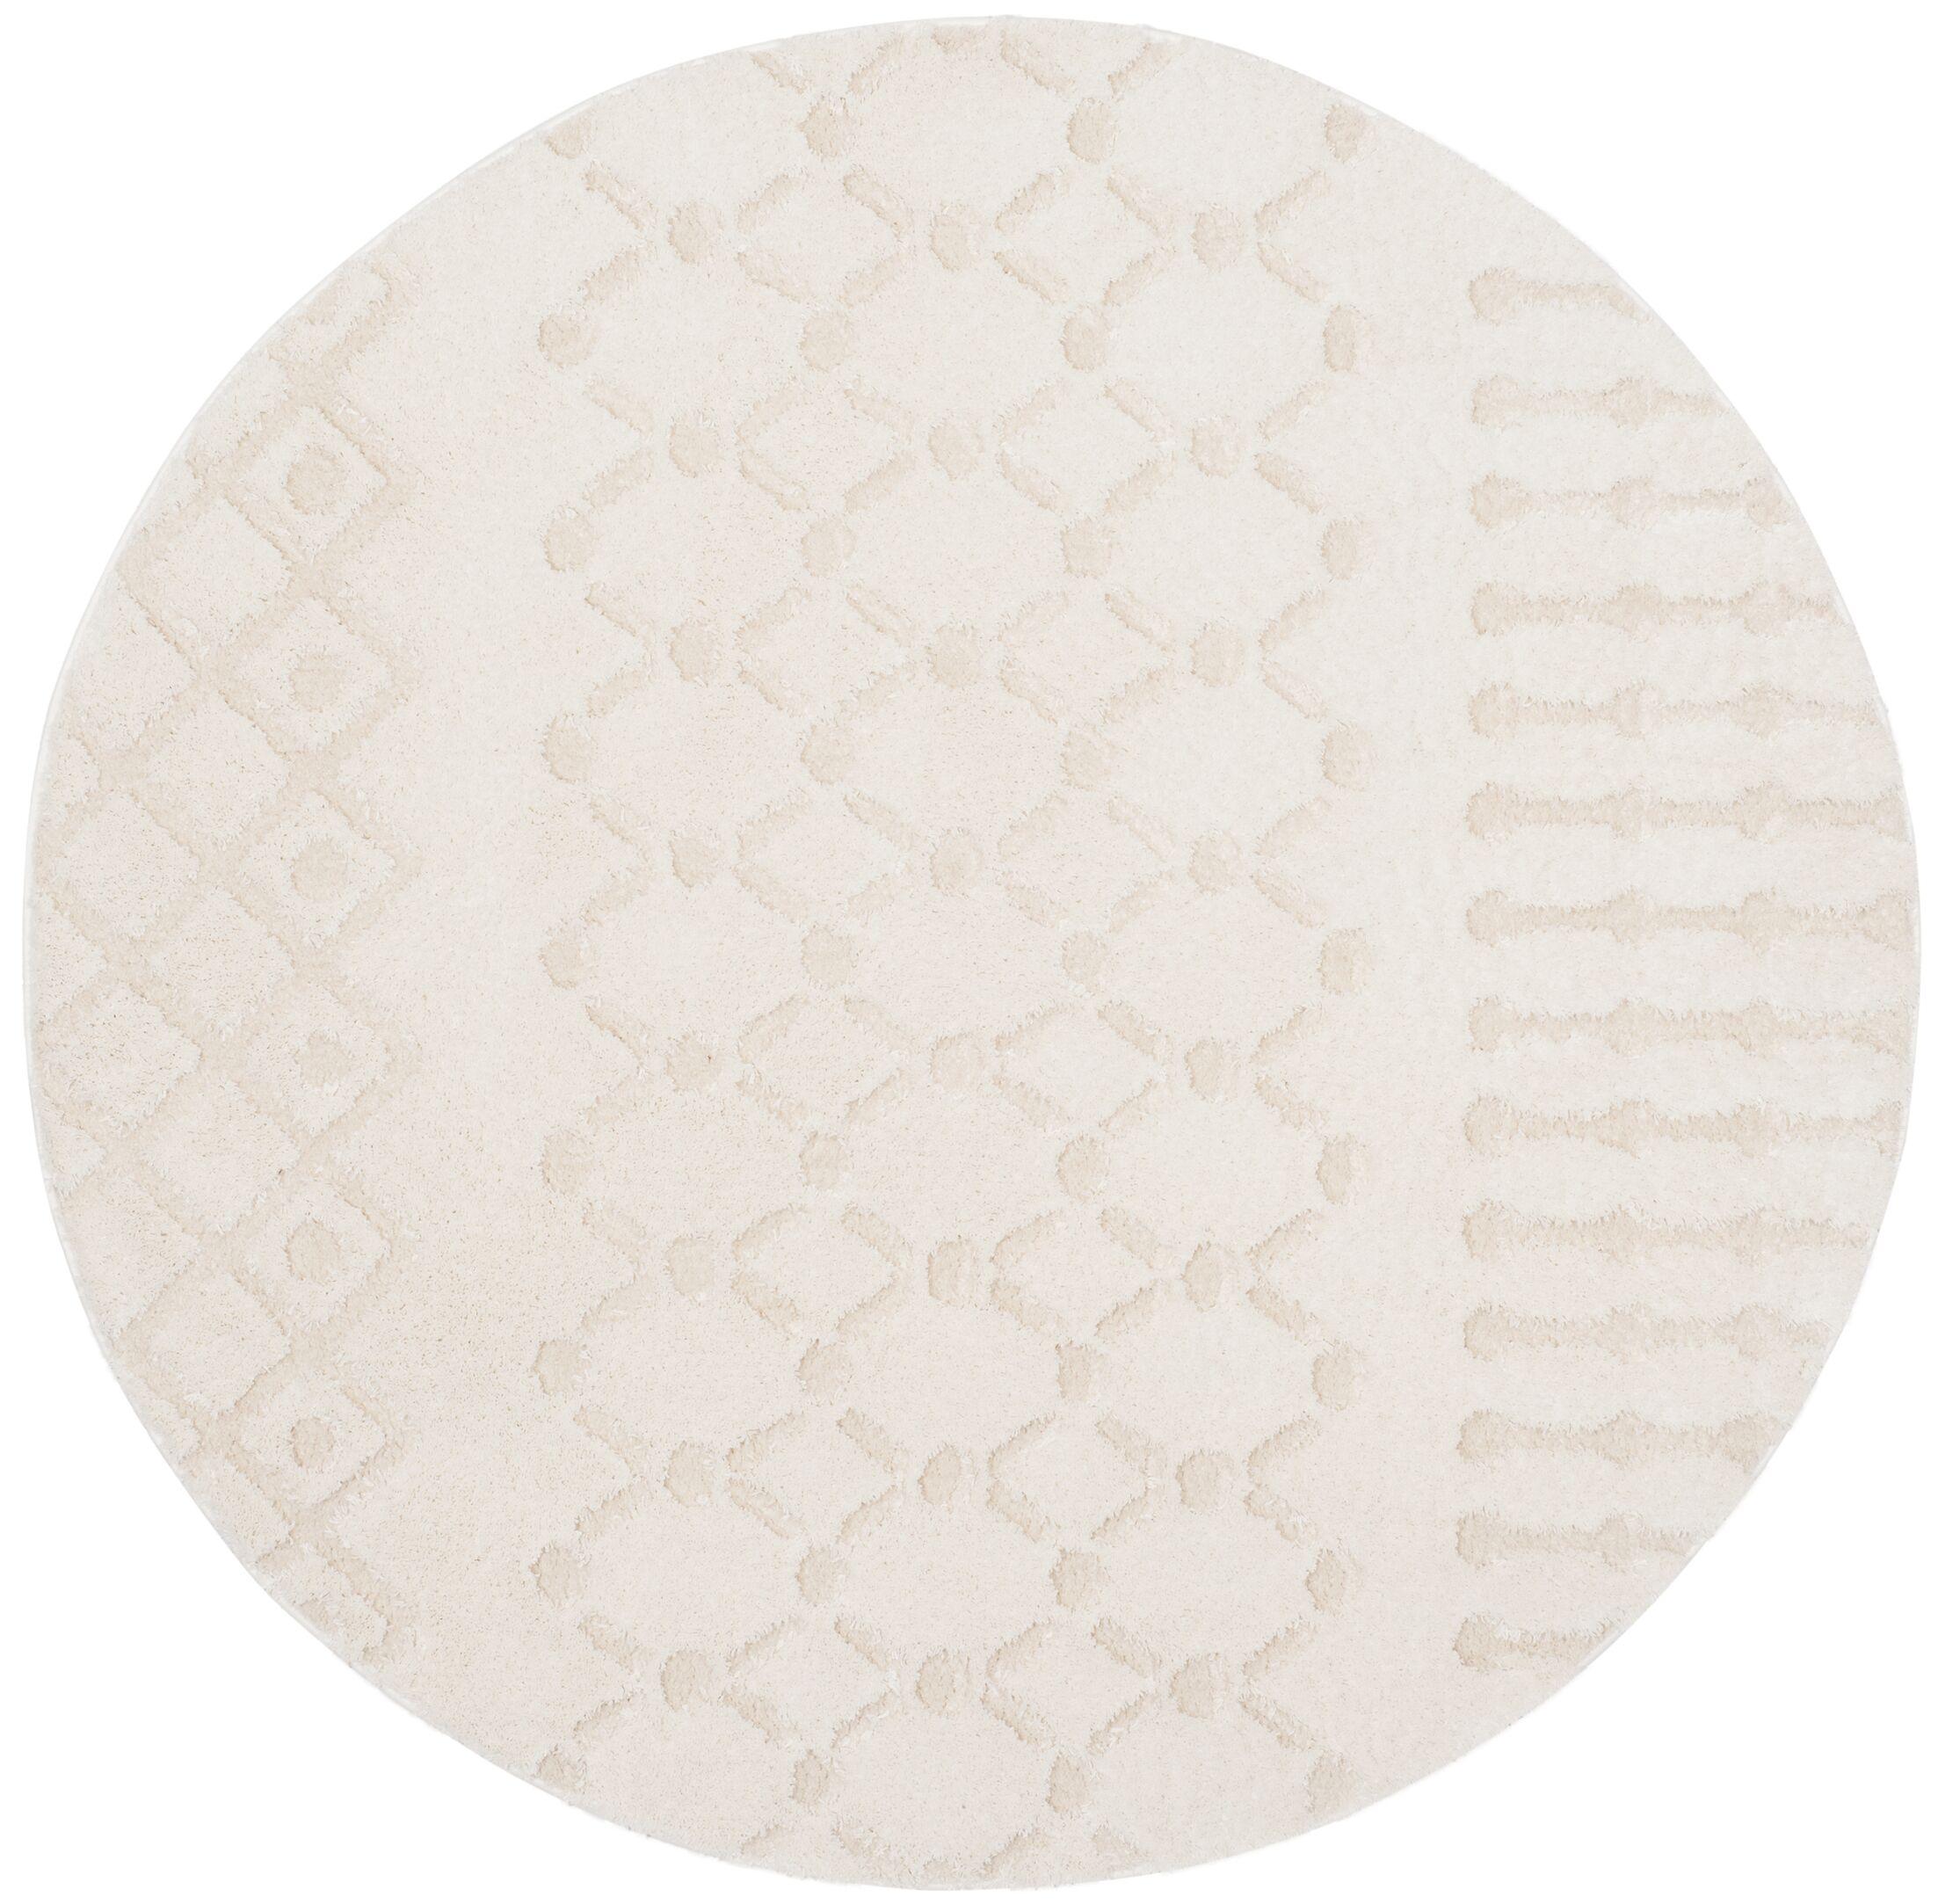 Burnvale Creme Area Rug Rug Size: Round 6'7